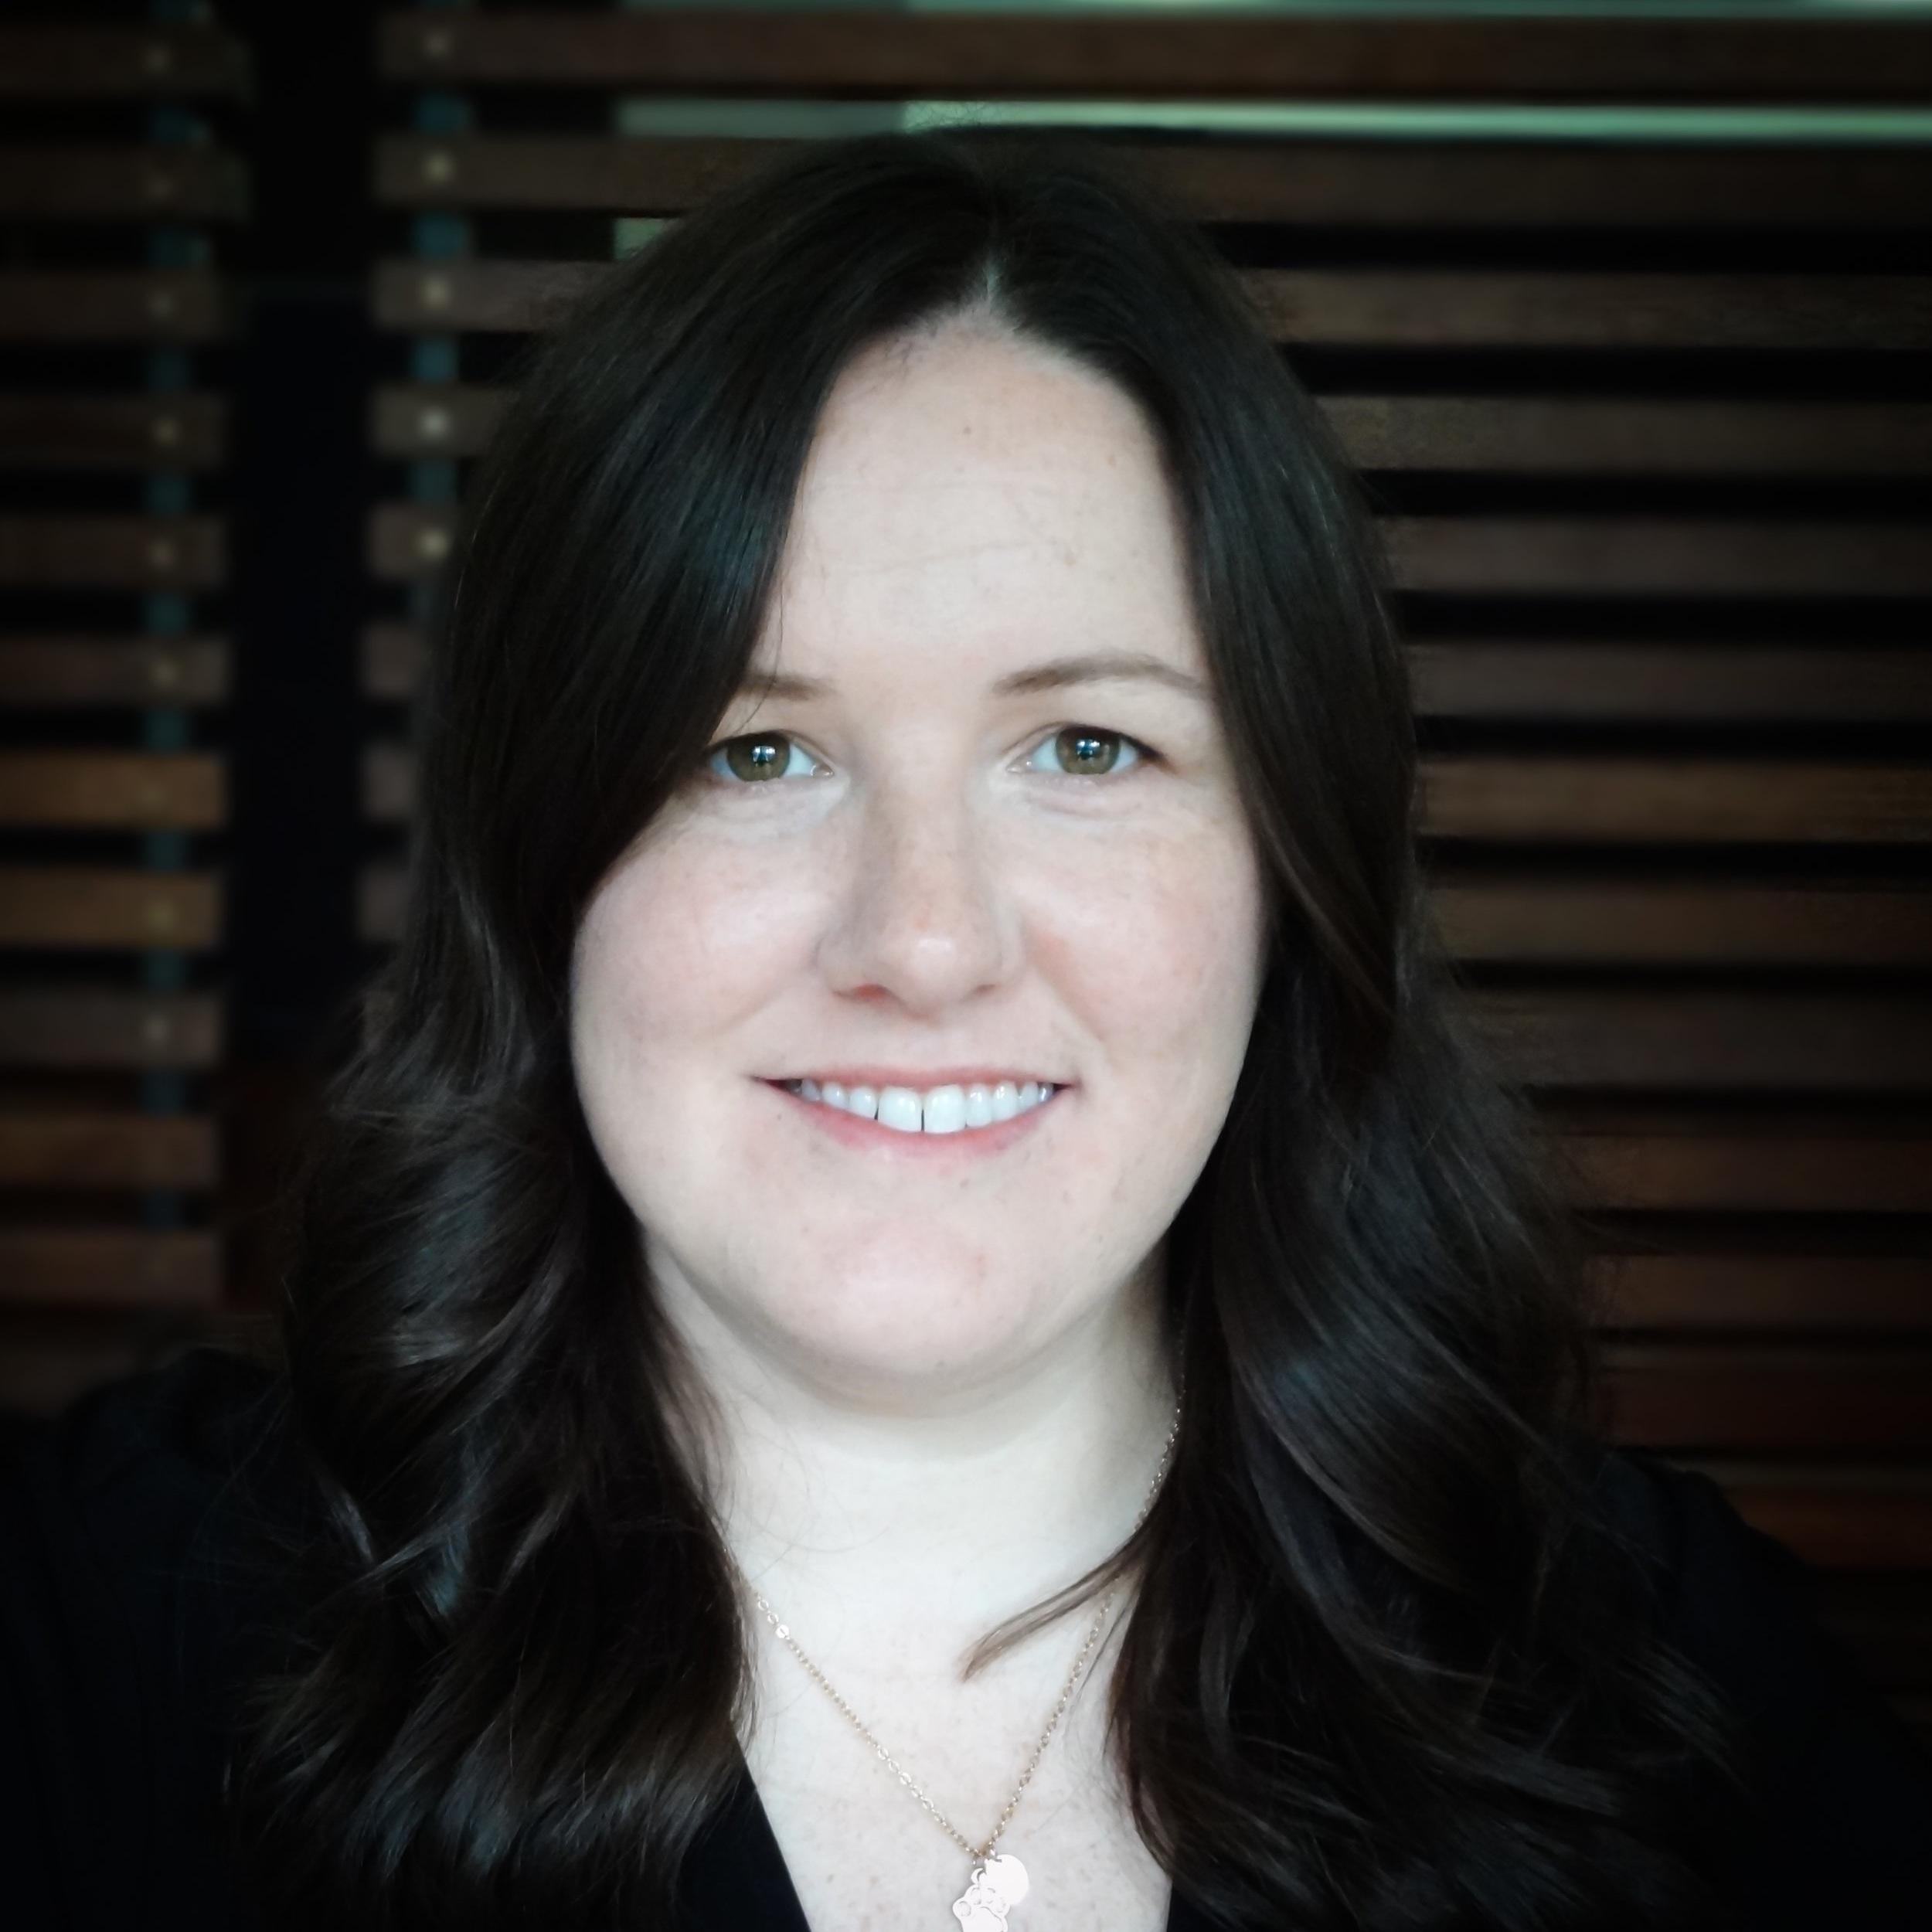 Julie Garey / US Role in nato's survival after the cold war - September 2019